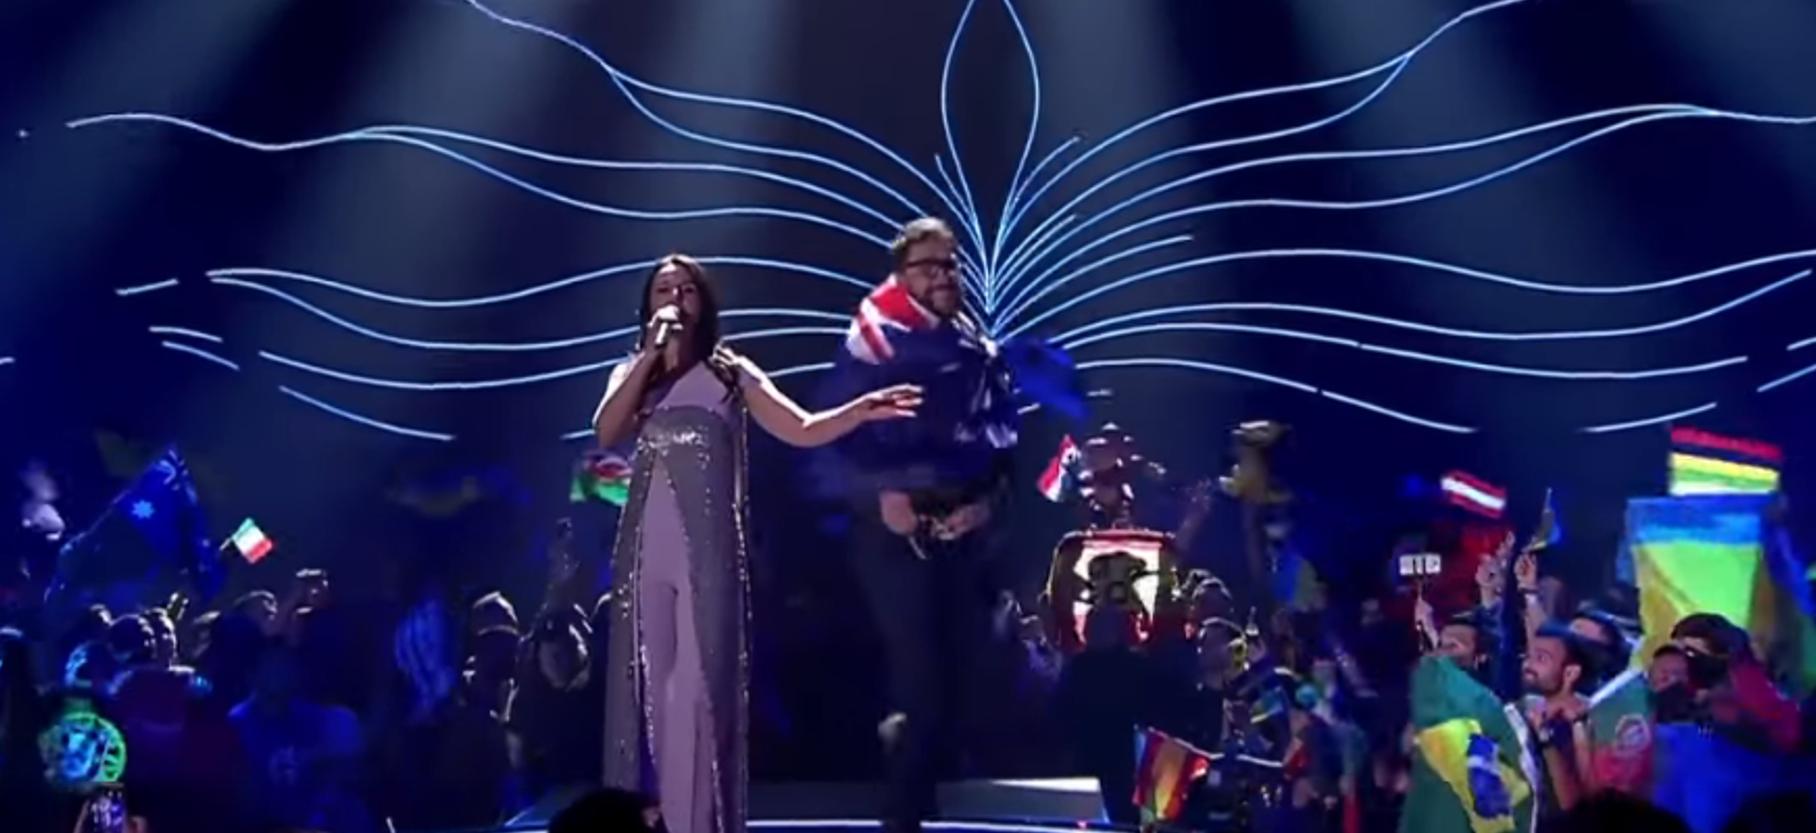 Jamala Jornalista Que Invadiu Palco No «Eurovision Song Contest» Multado